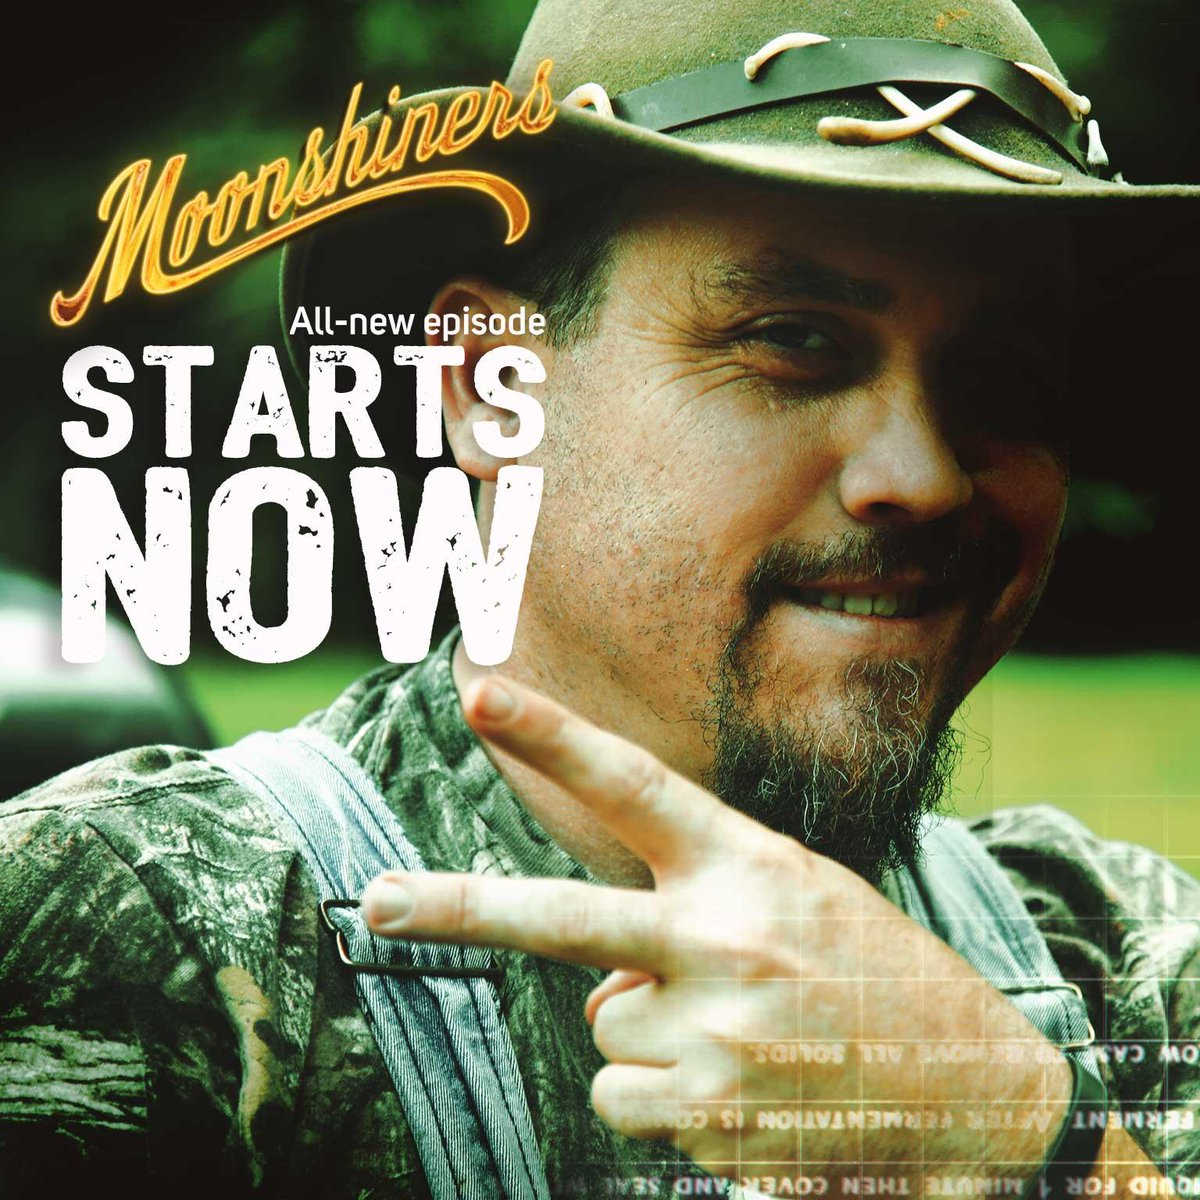 moonshiners season 3 ep 4